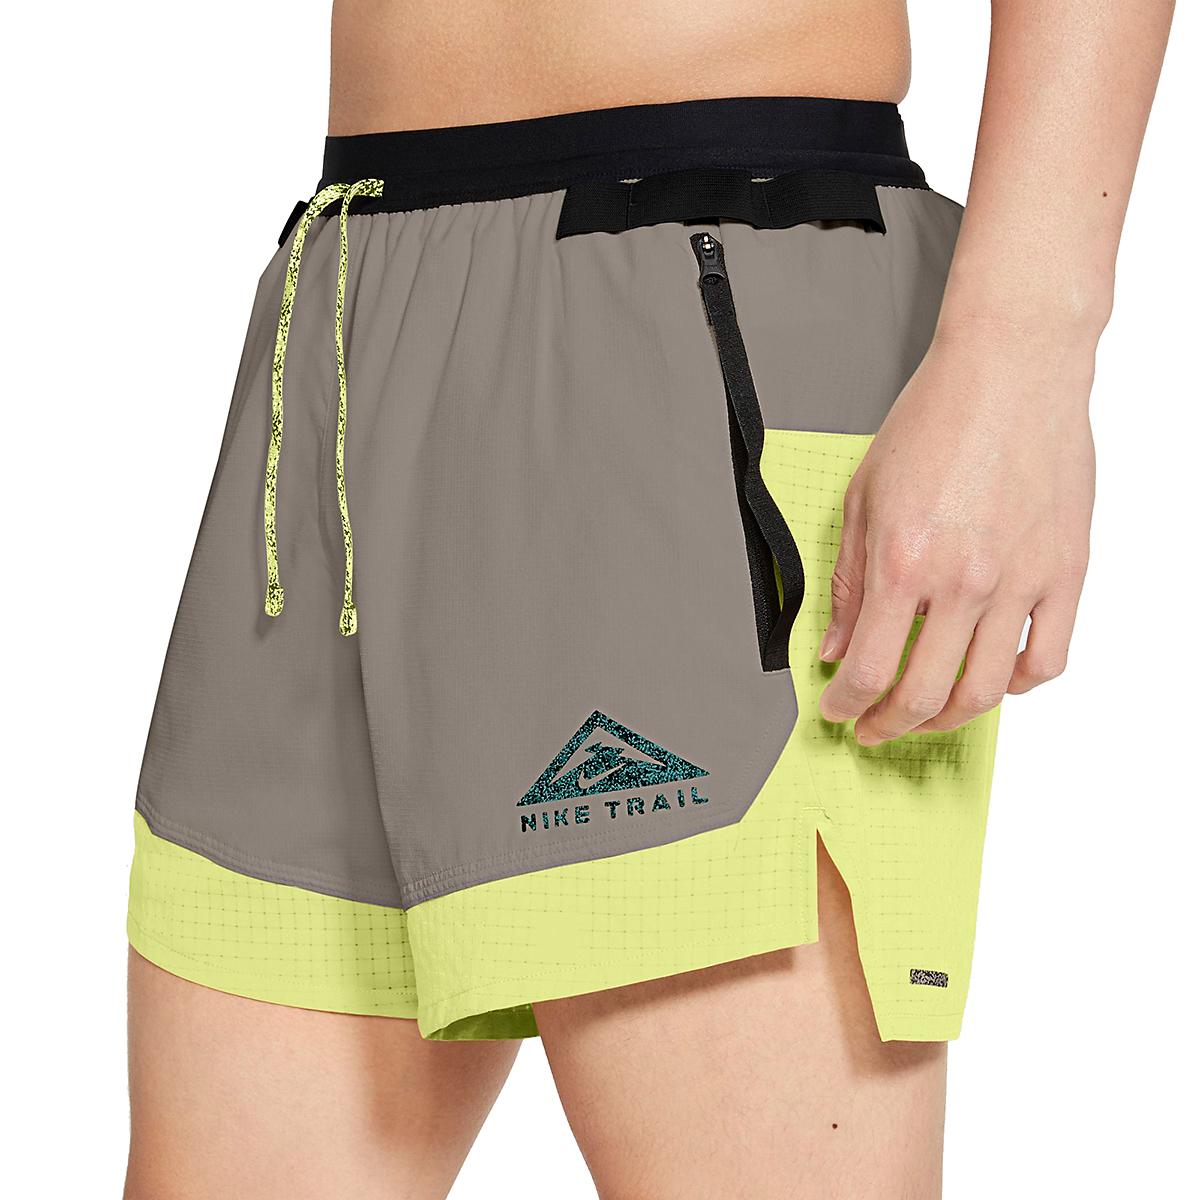 Men's Nike Dri-FIT Flex Stride Trail Shorts - Color: Light Lemon Twist/Moon Fossil/Bright Spruce - Size: S, Light Lemon Twist/Moon Fossil/Bright Spruce, large, image 3